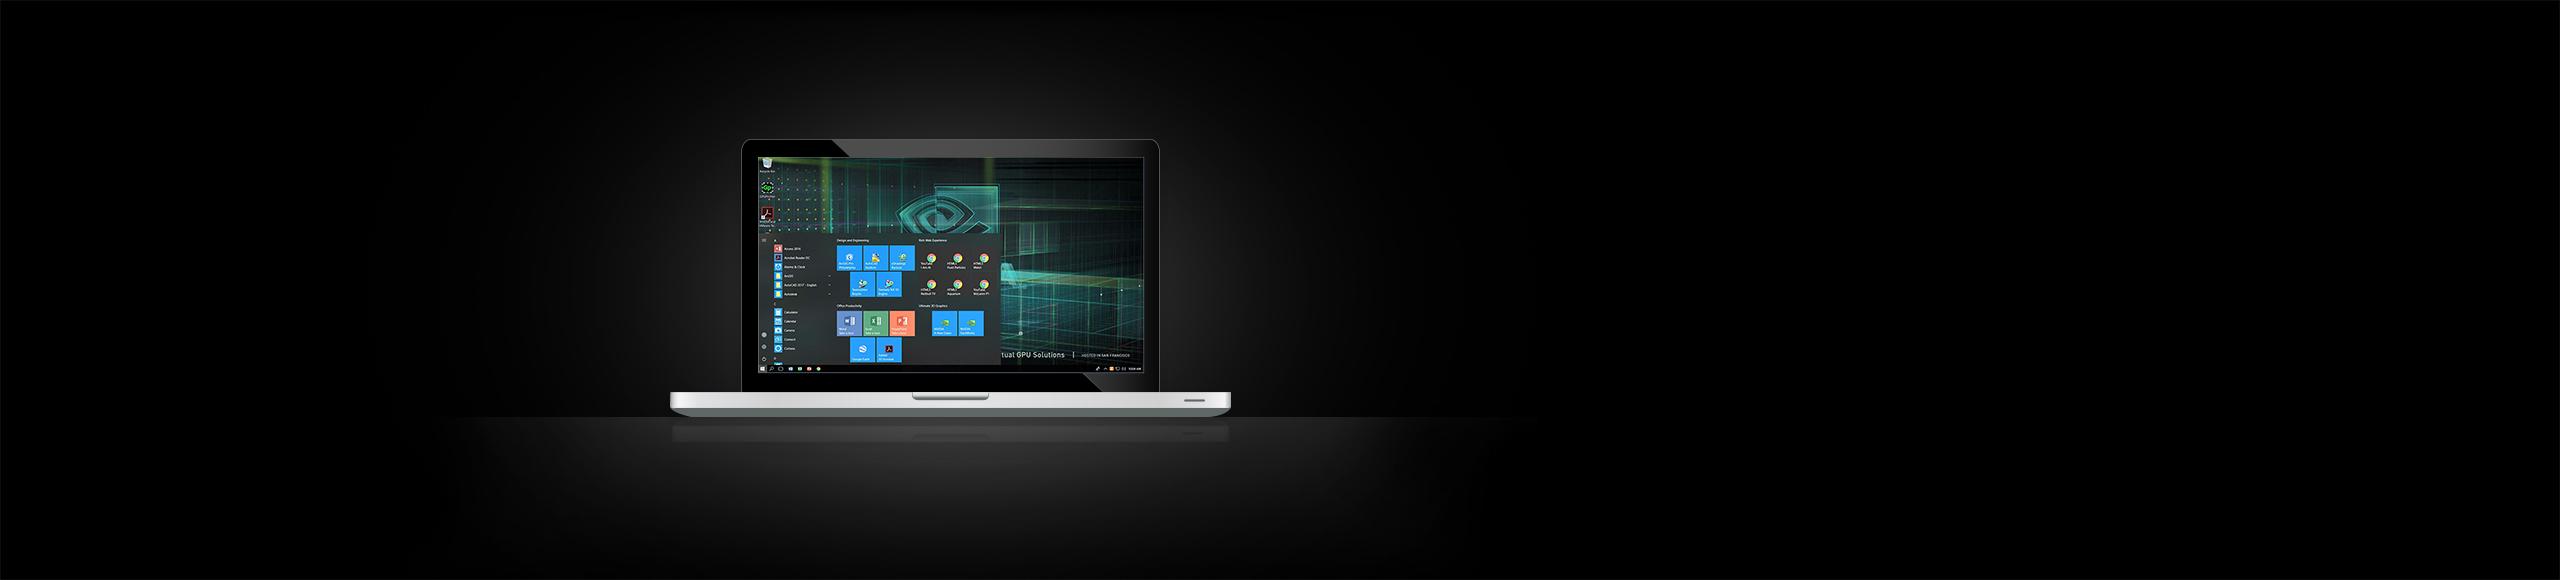 Free Trial: Test Drive VMware on NVIDIA Virtual GPUs | NVIDIA